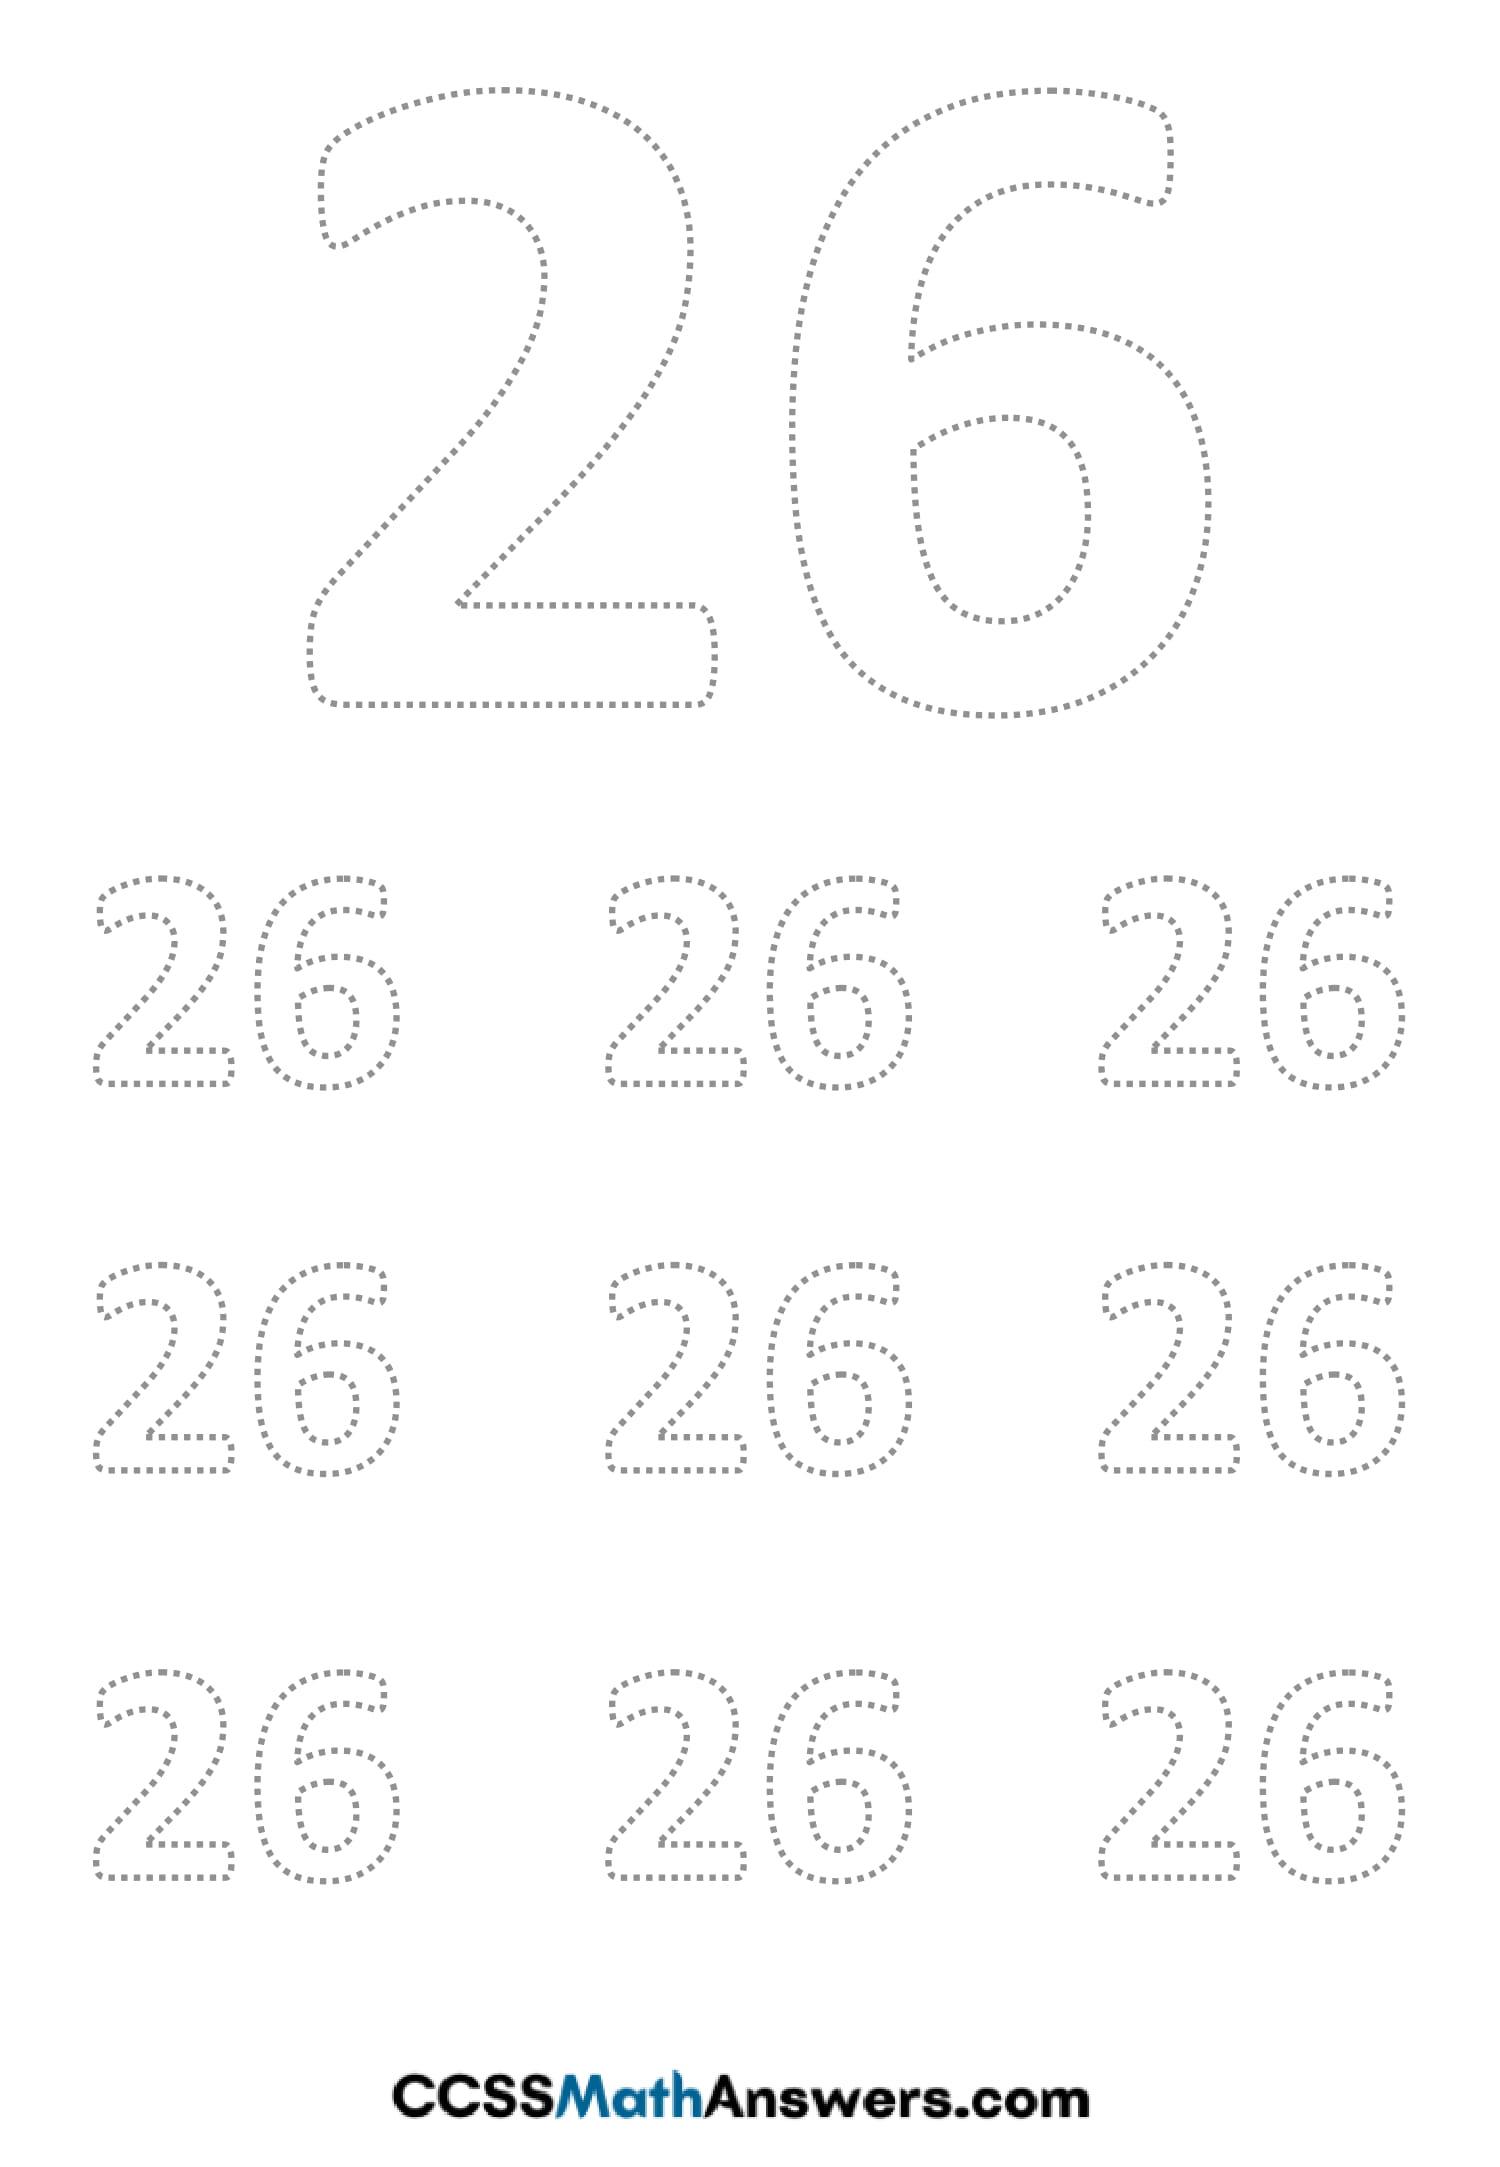 Worksheet on Number Twenty Six